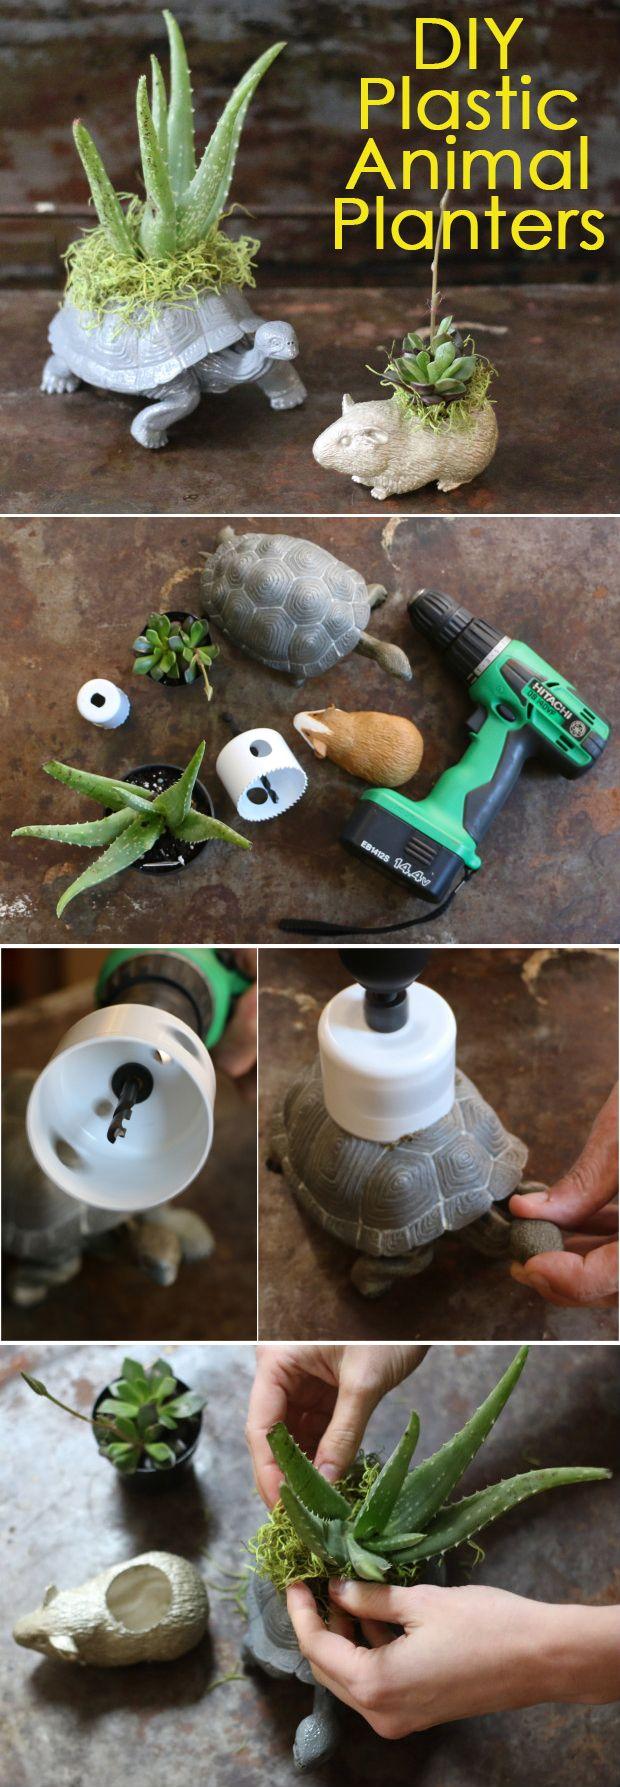 How cute! Transform plastic animals into planters!  #diy #crafts